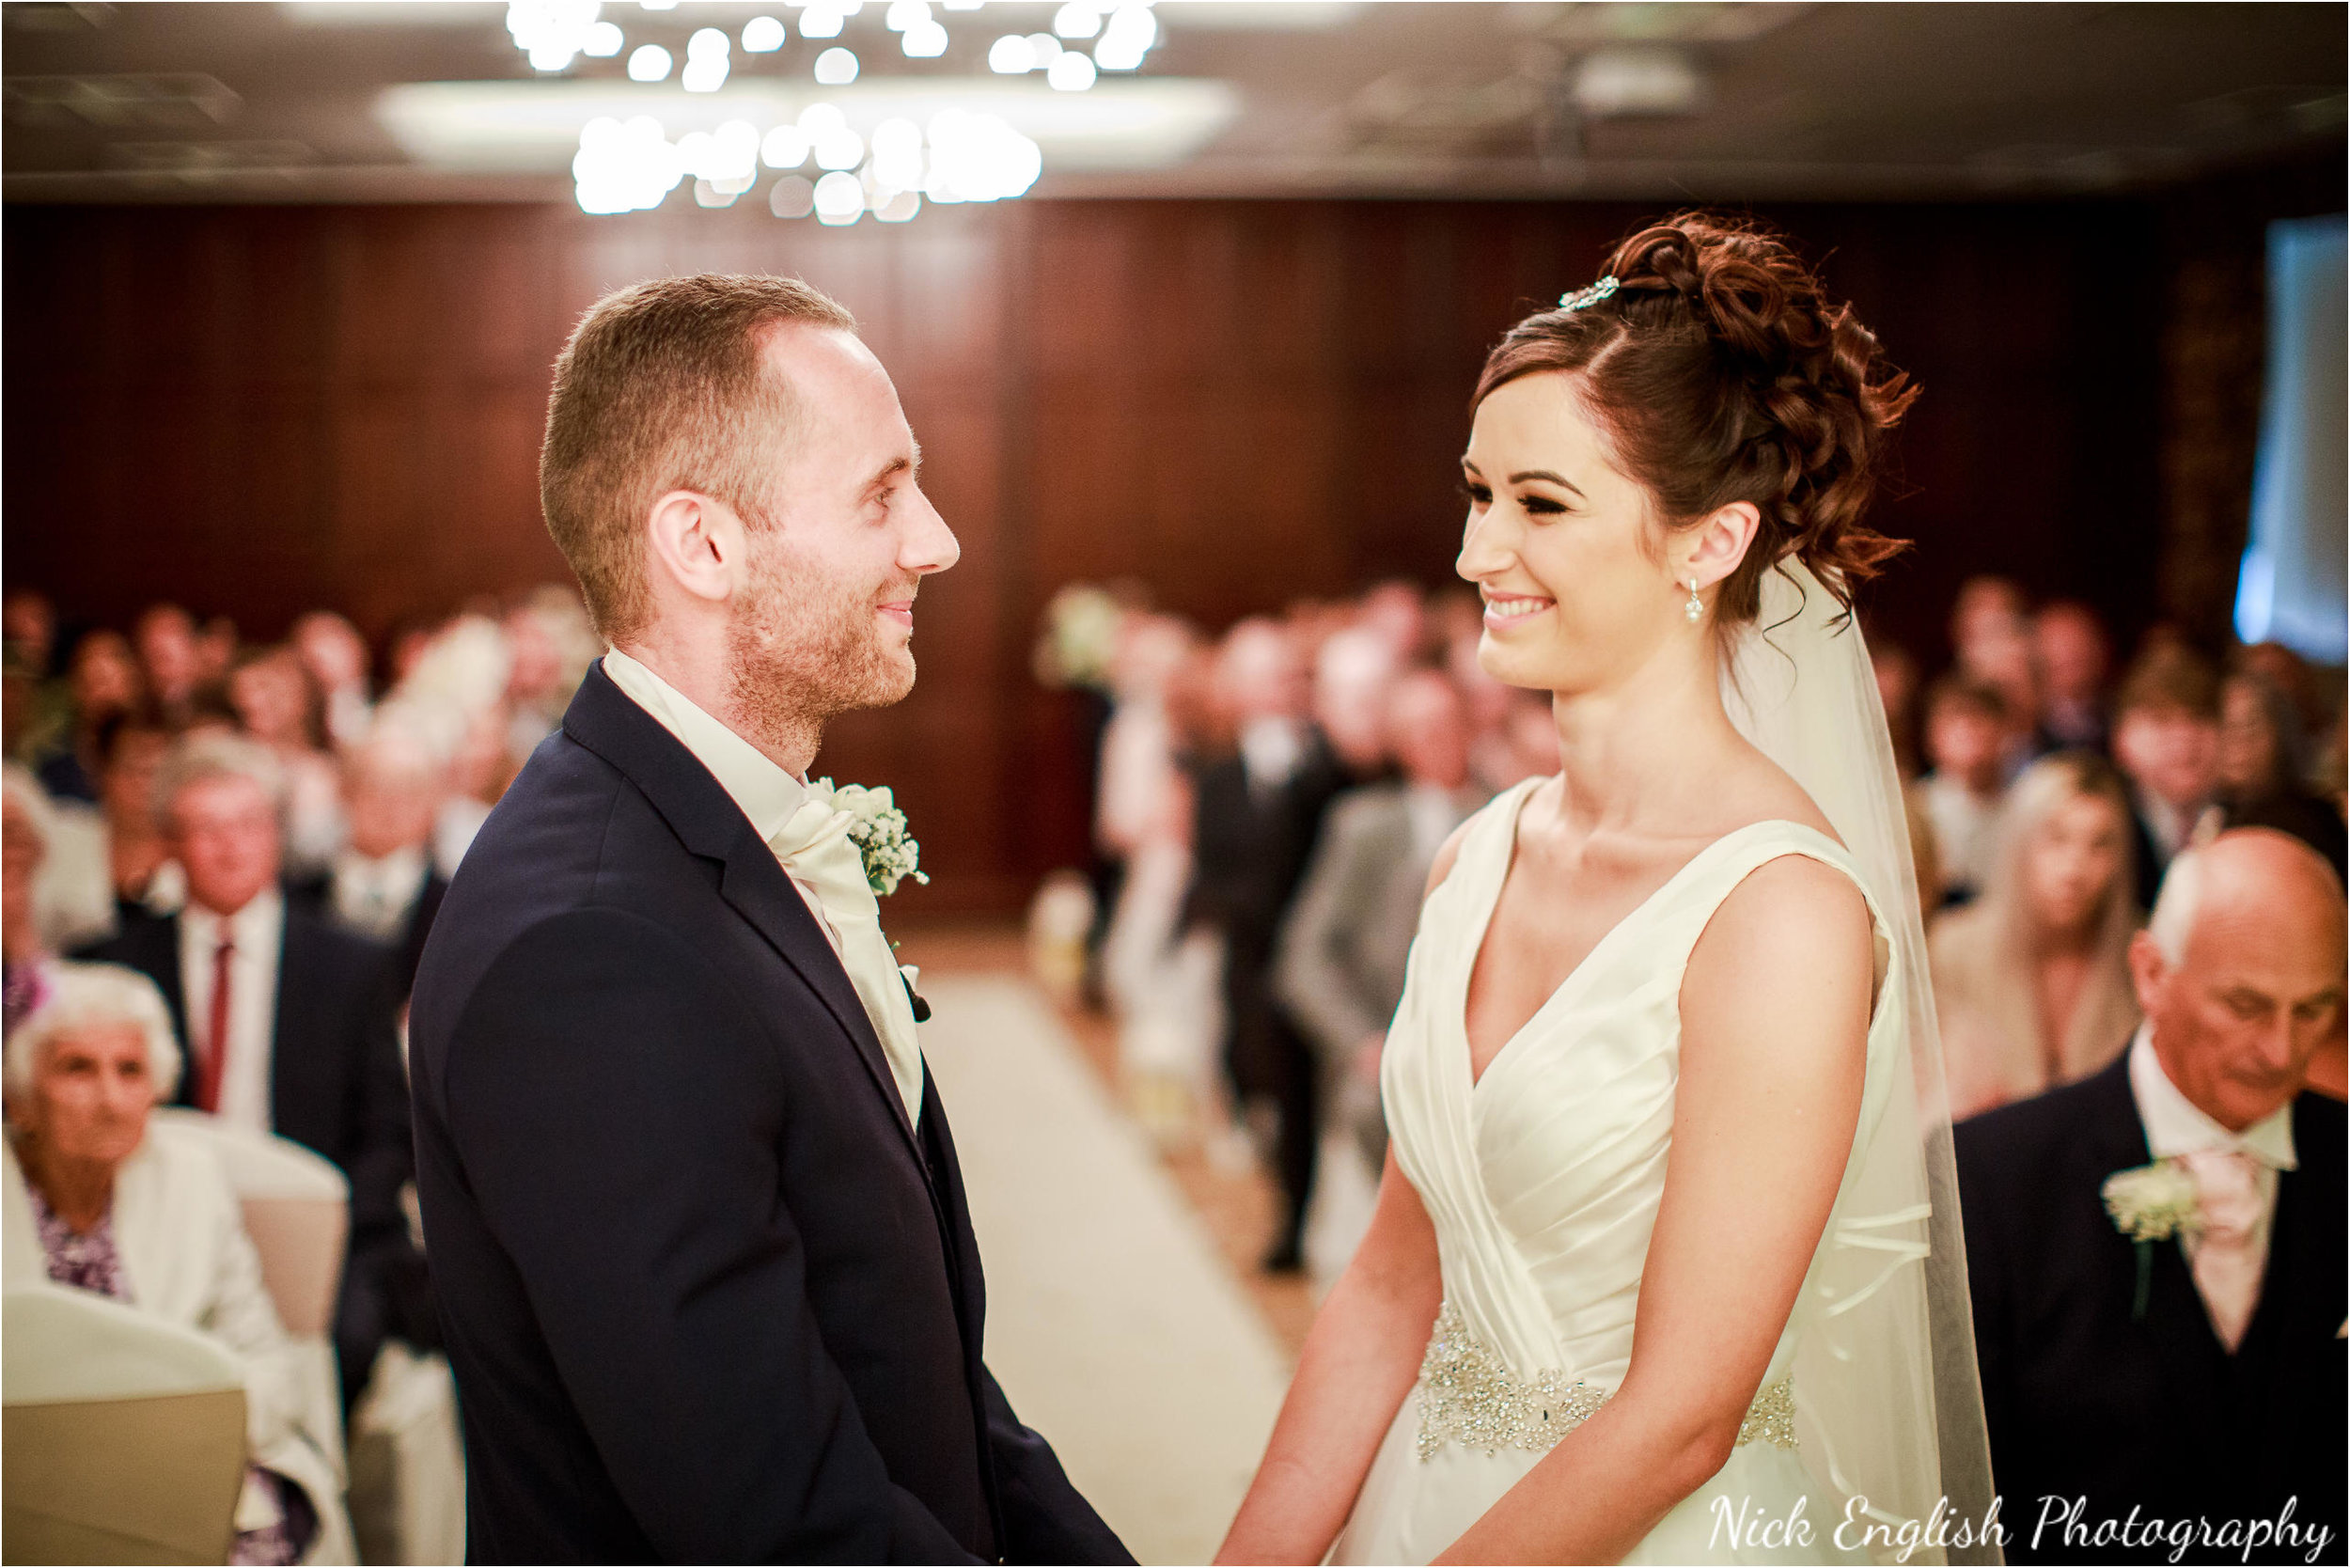 Emily David Wedding Photographs at Barton Grange Preston by Nick English Photography 63jpg.jpeg